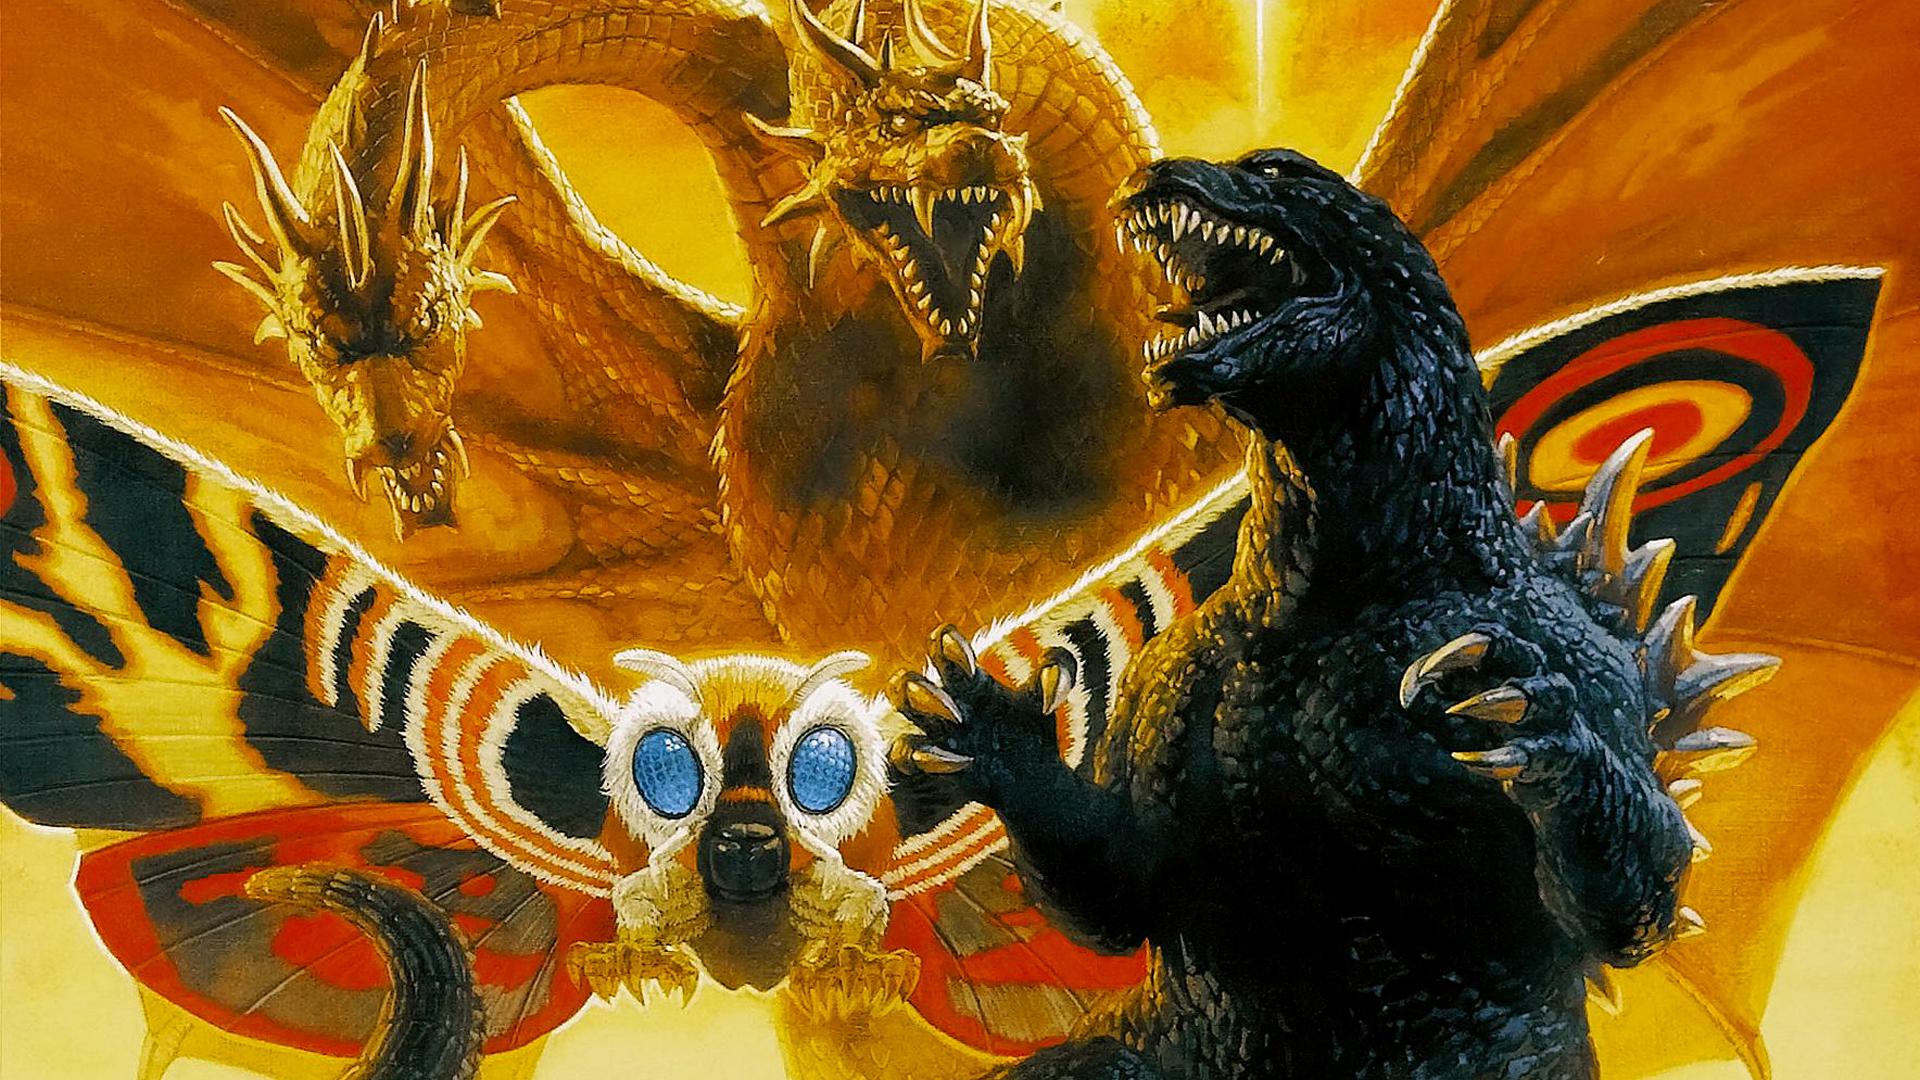 Godzilla images Godzilla Mothra and King Ghidorah Wallpaper wallpaper 1920x1080